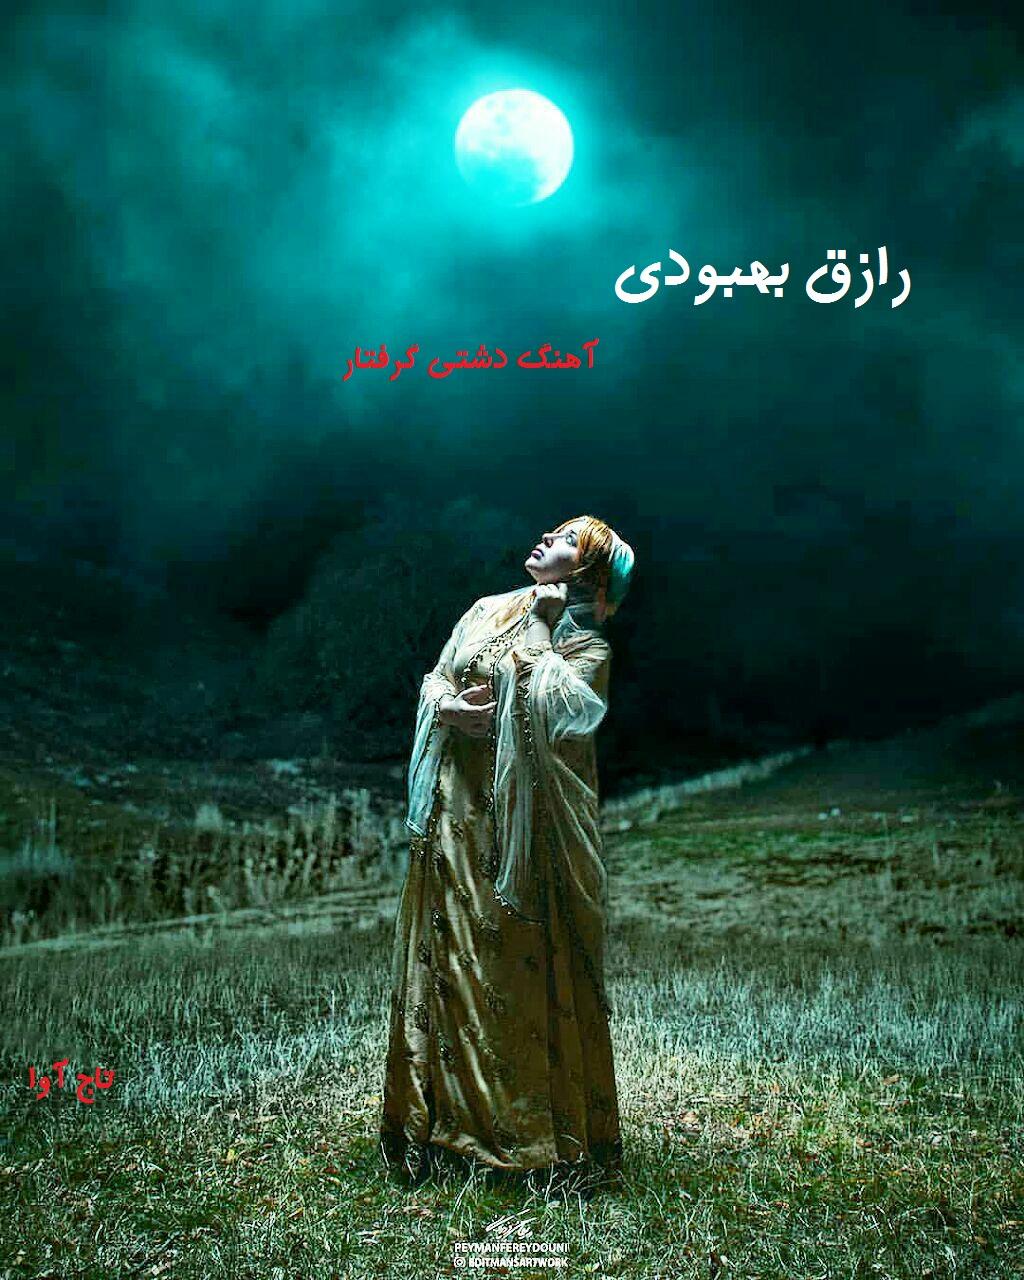 455 RazaghBehboudi Greftar آهنگ گرفتار از رزاق بهبودی